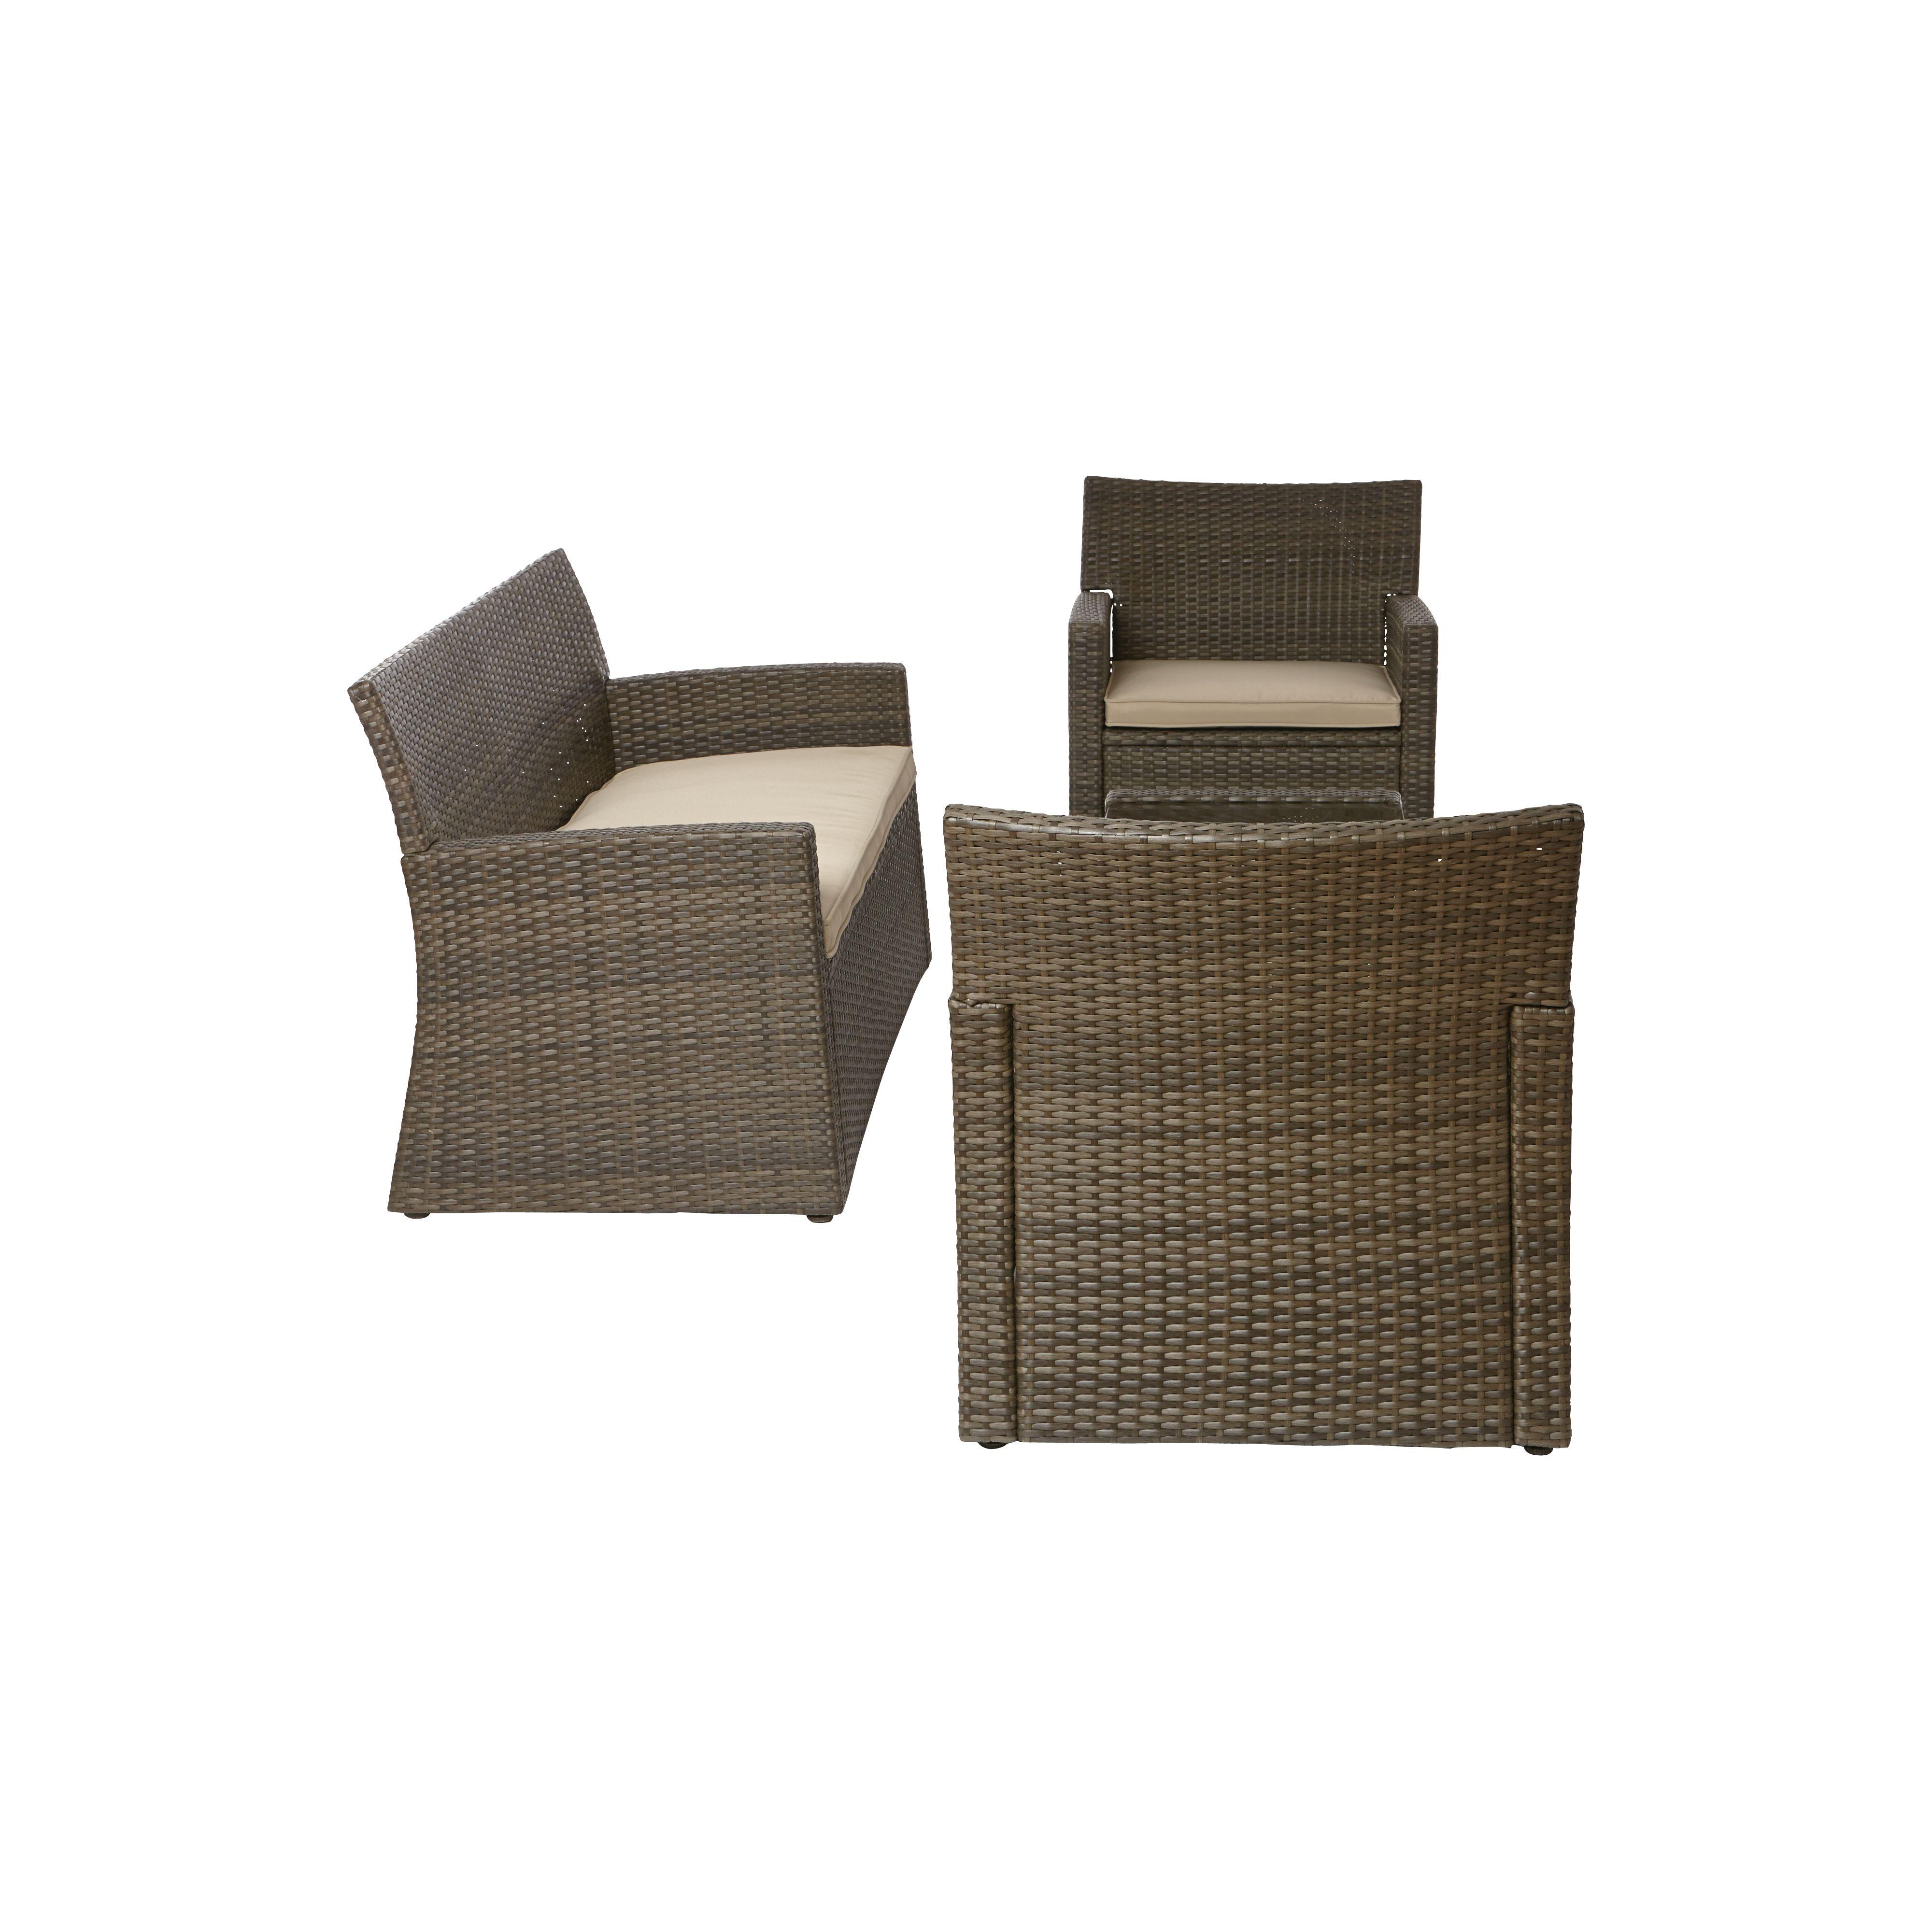 Mali Rattan Effect Garden Sofa Set